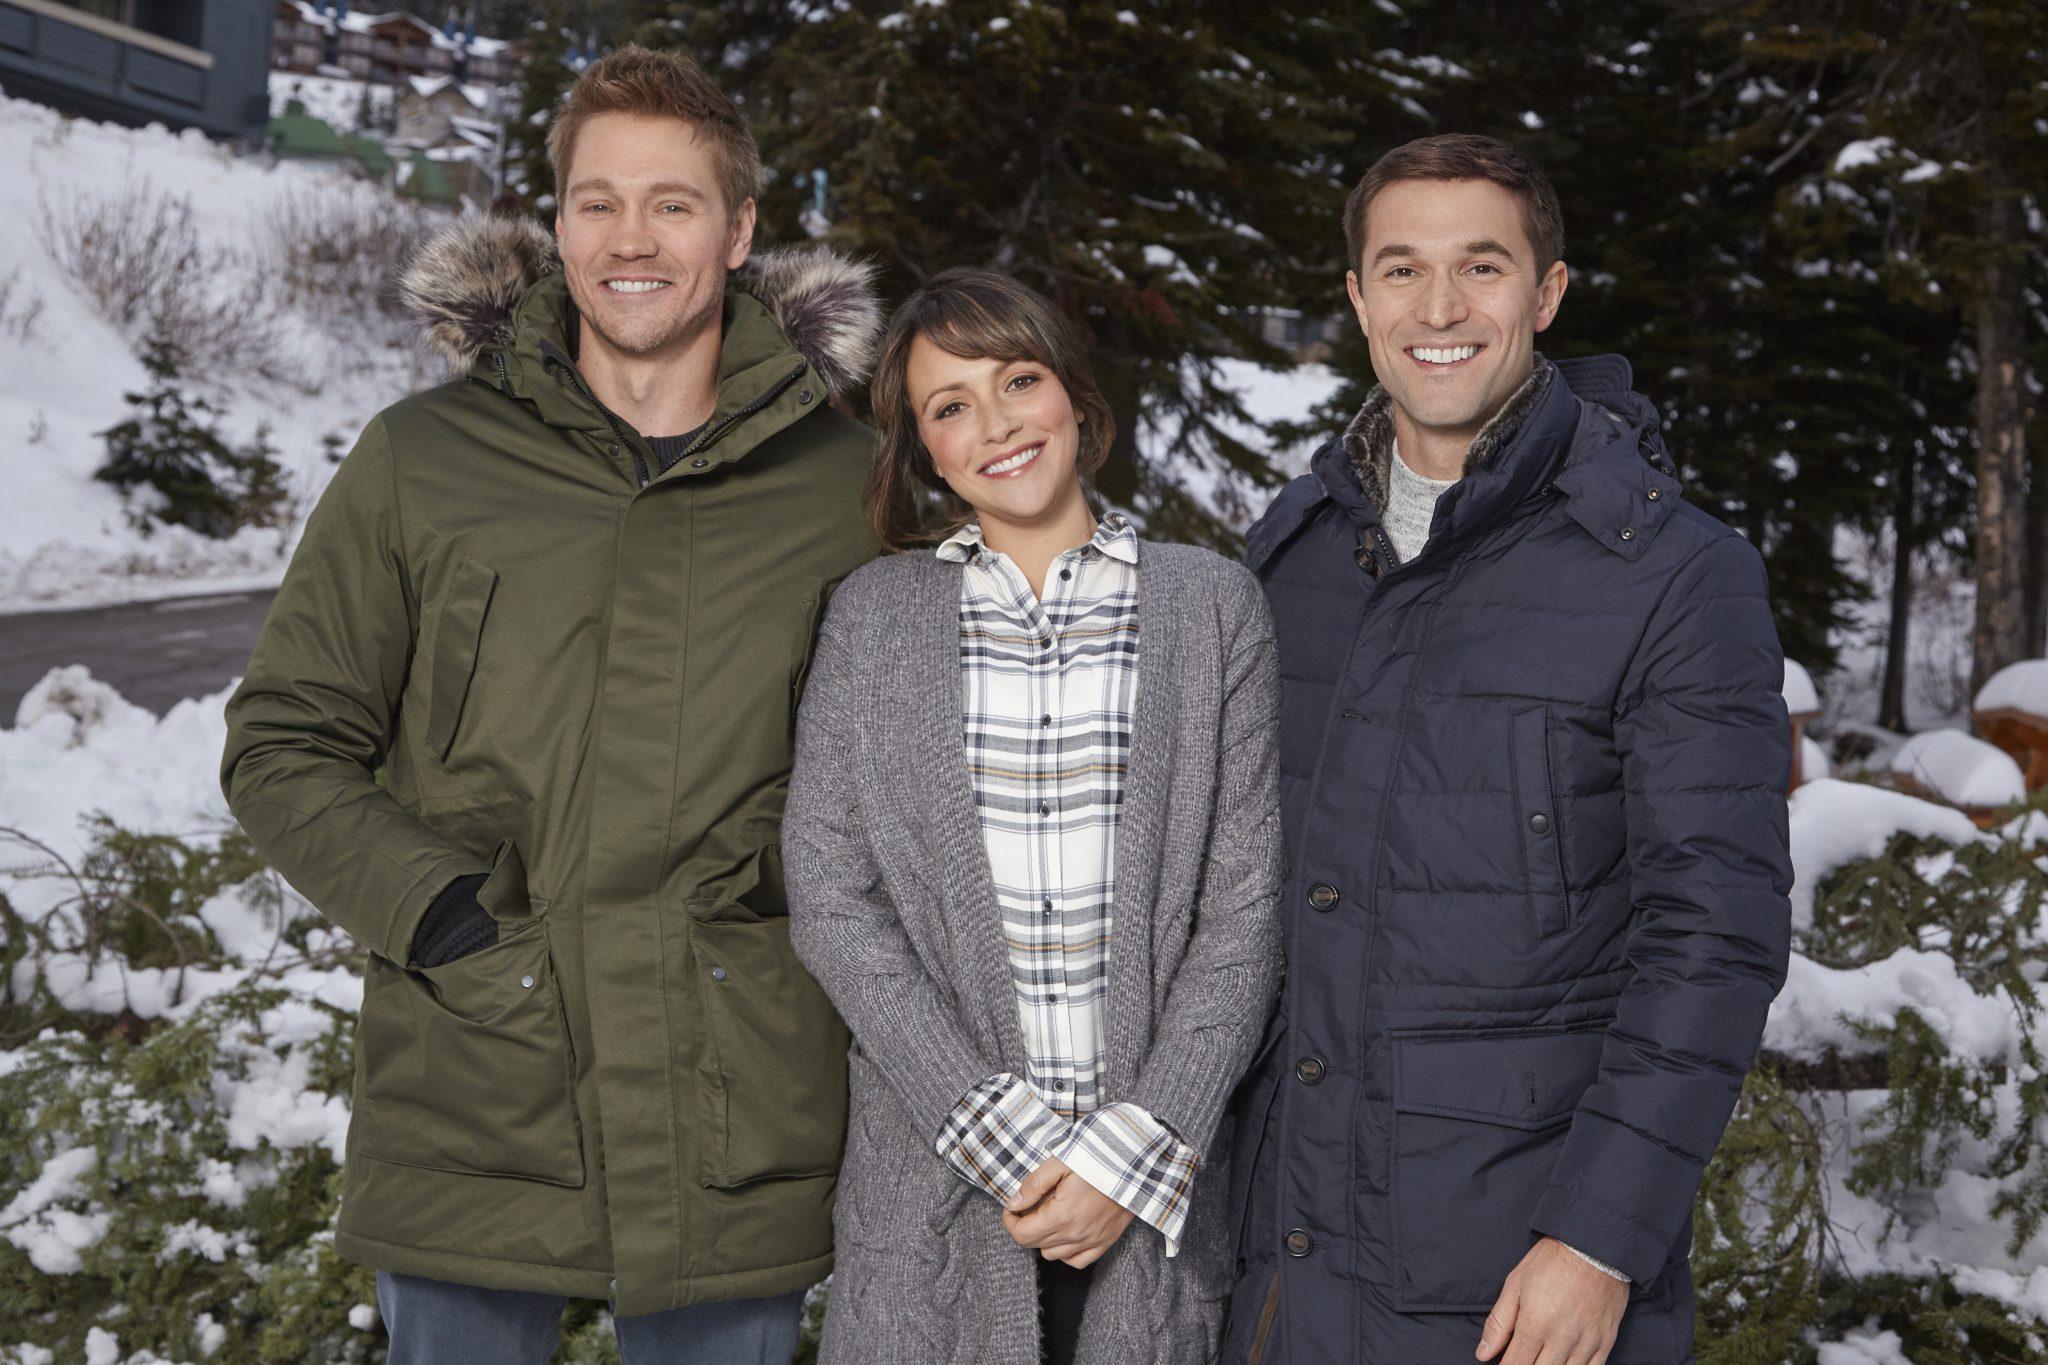 Love in Winterland, Hallmark Photo: Chad Michael Murray, Italia Ricci, Jack Turner Credit: ©2019 Crown Media United States LLC/Photographer:Jen Osborne